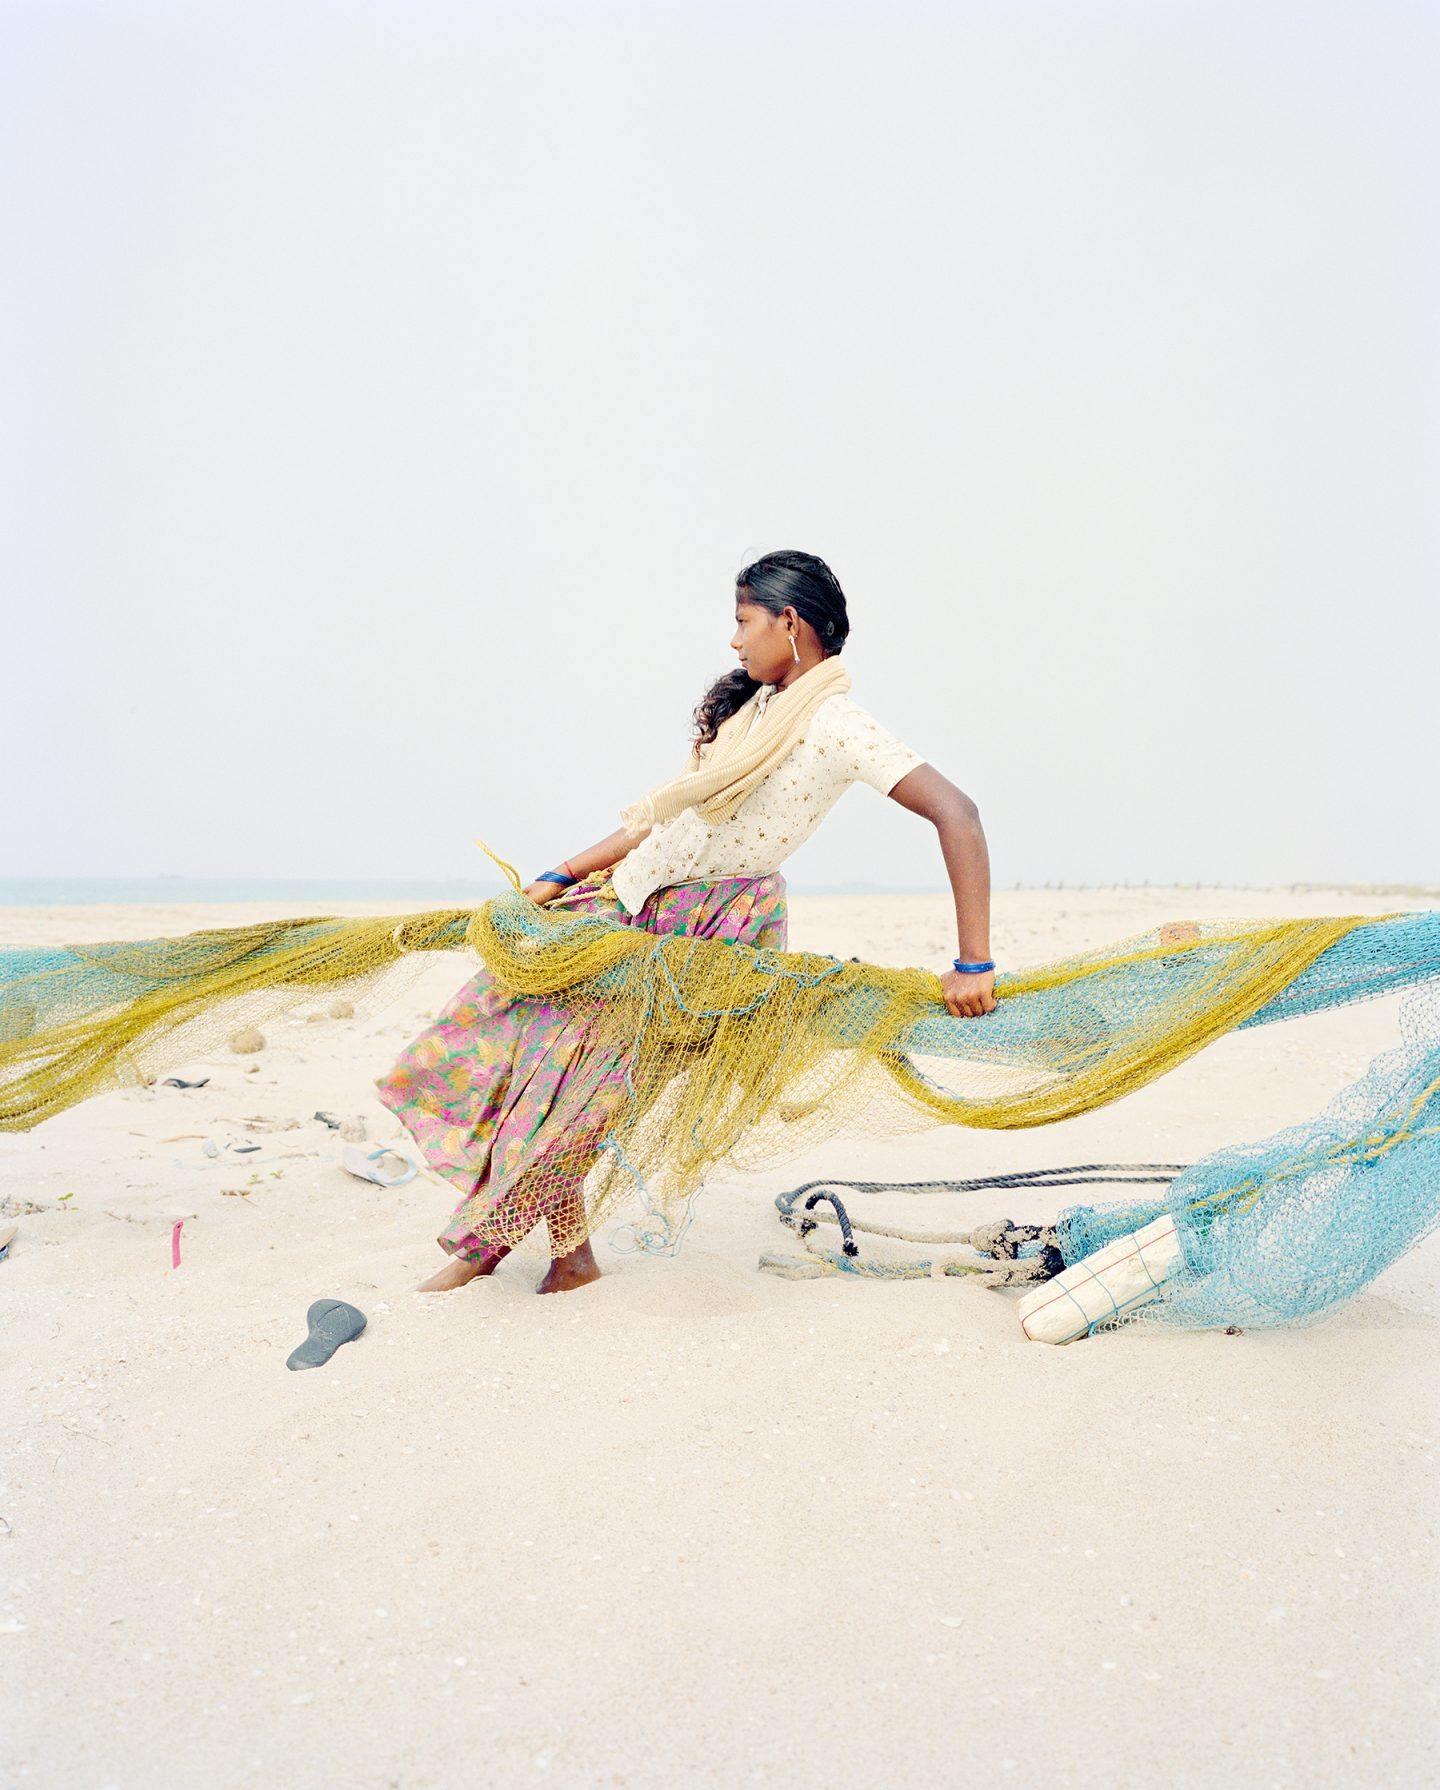 IGNANT-Photography-Vasantha-Yogananthan-Howling-Winds-14